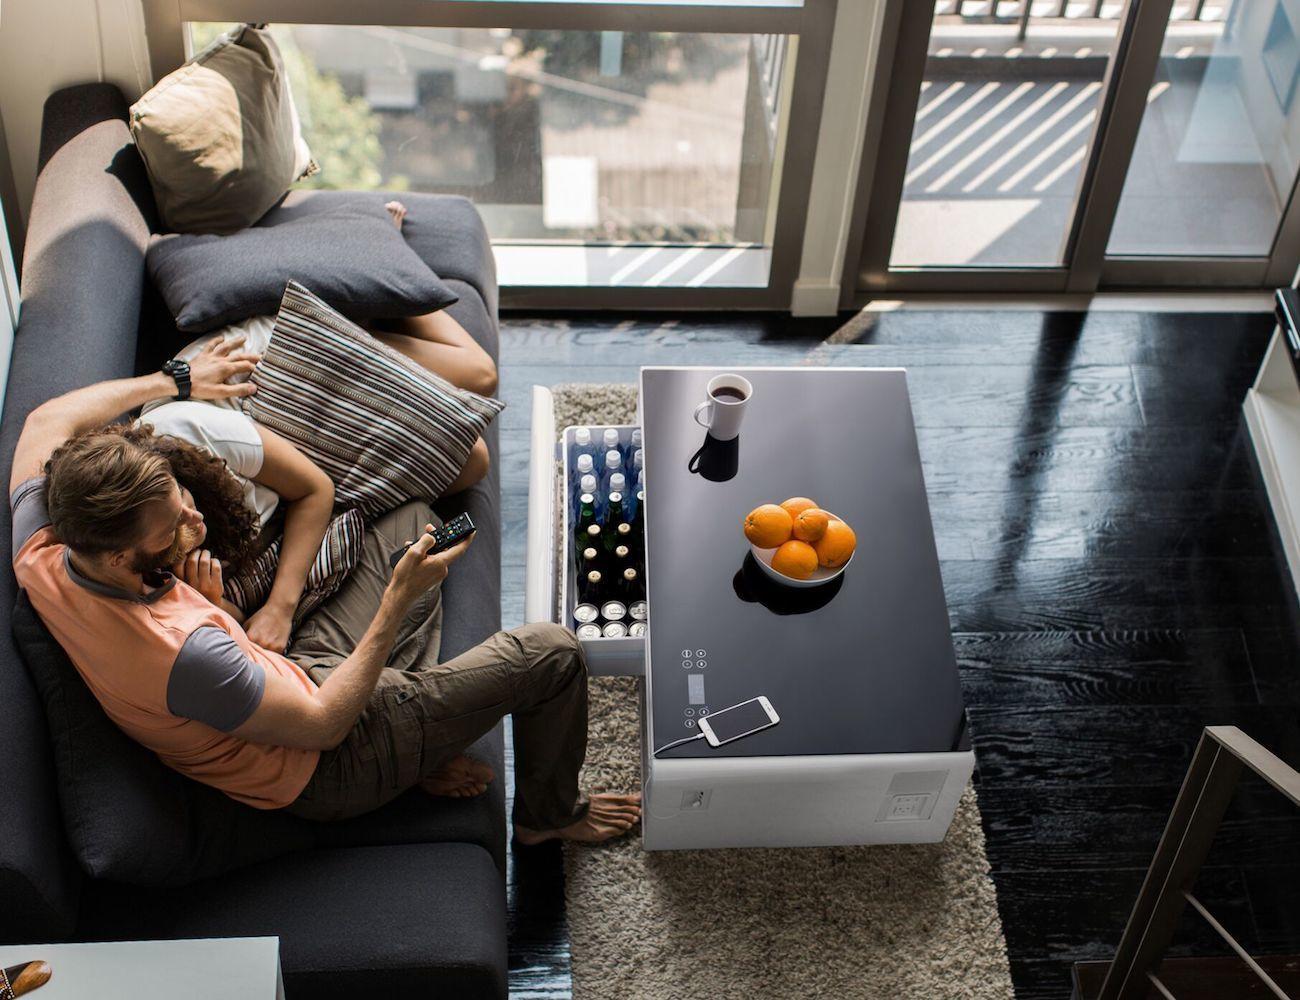 Sobro Cooler Coffee Table » Gadget Flow kidd Cool